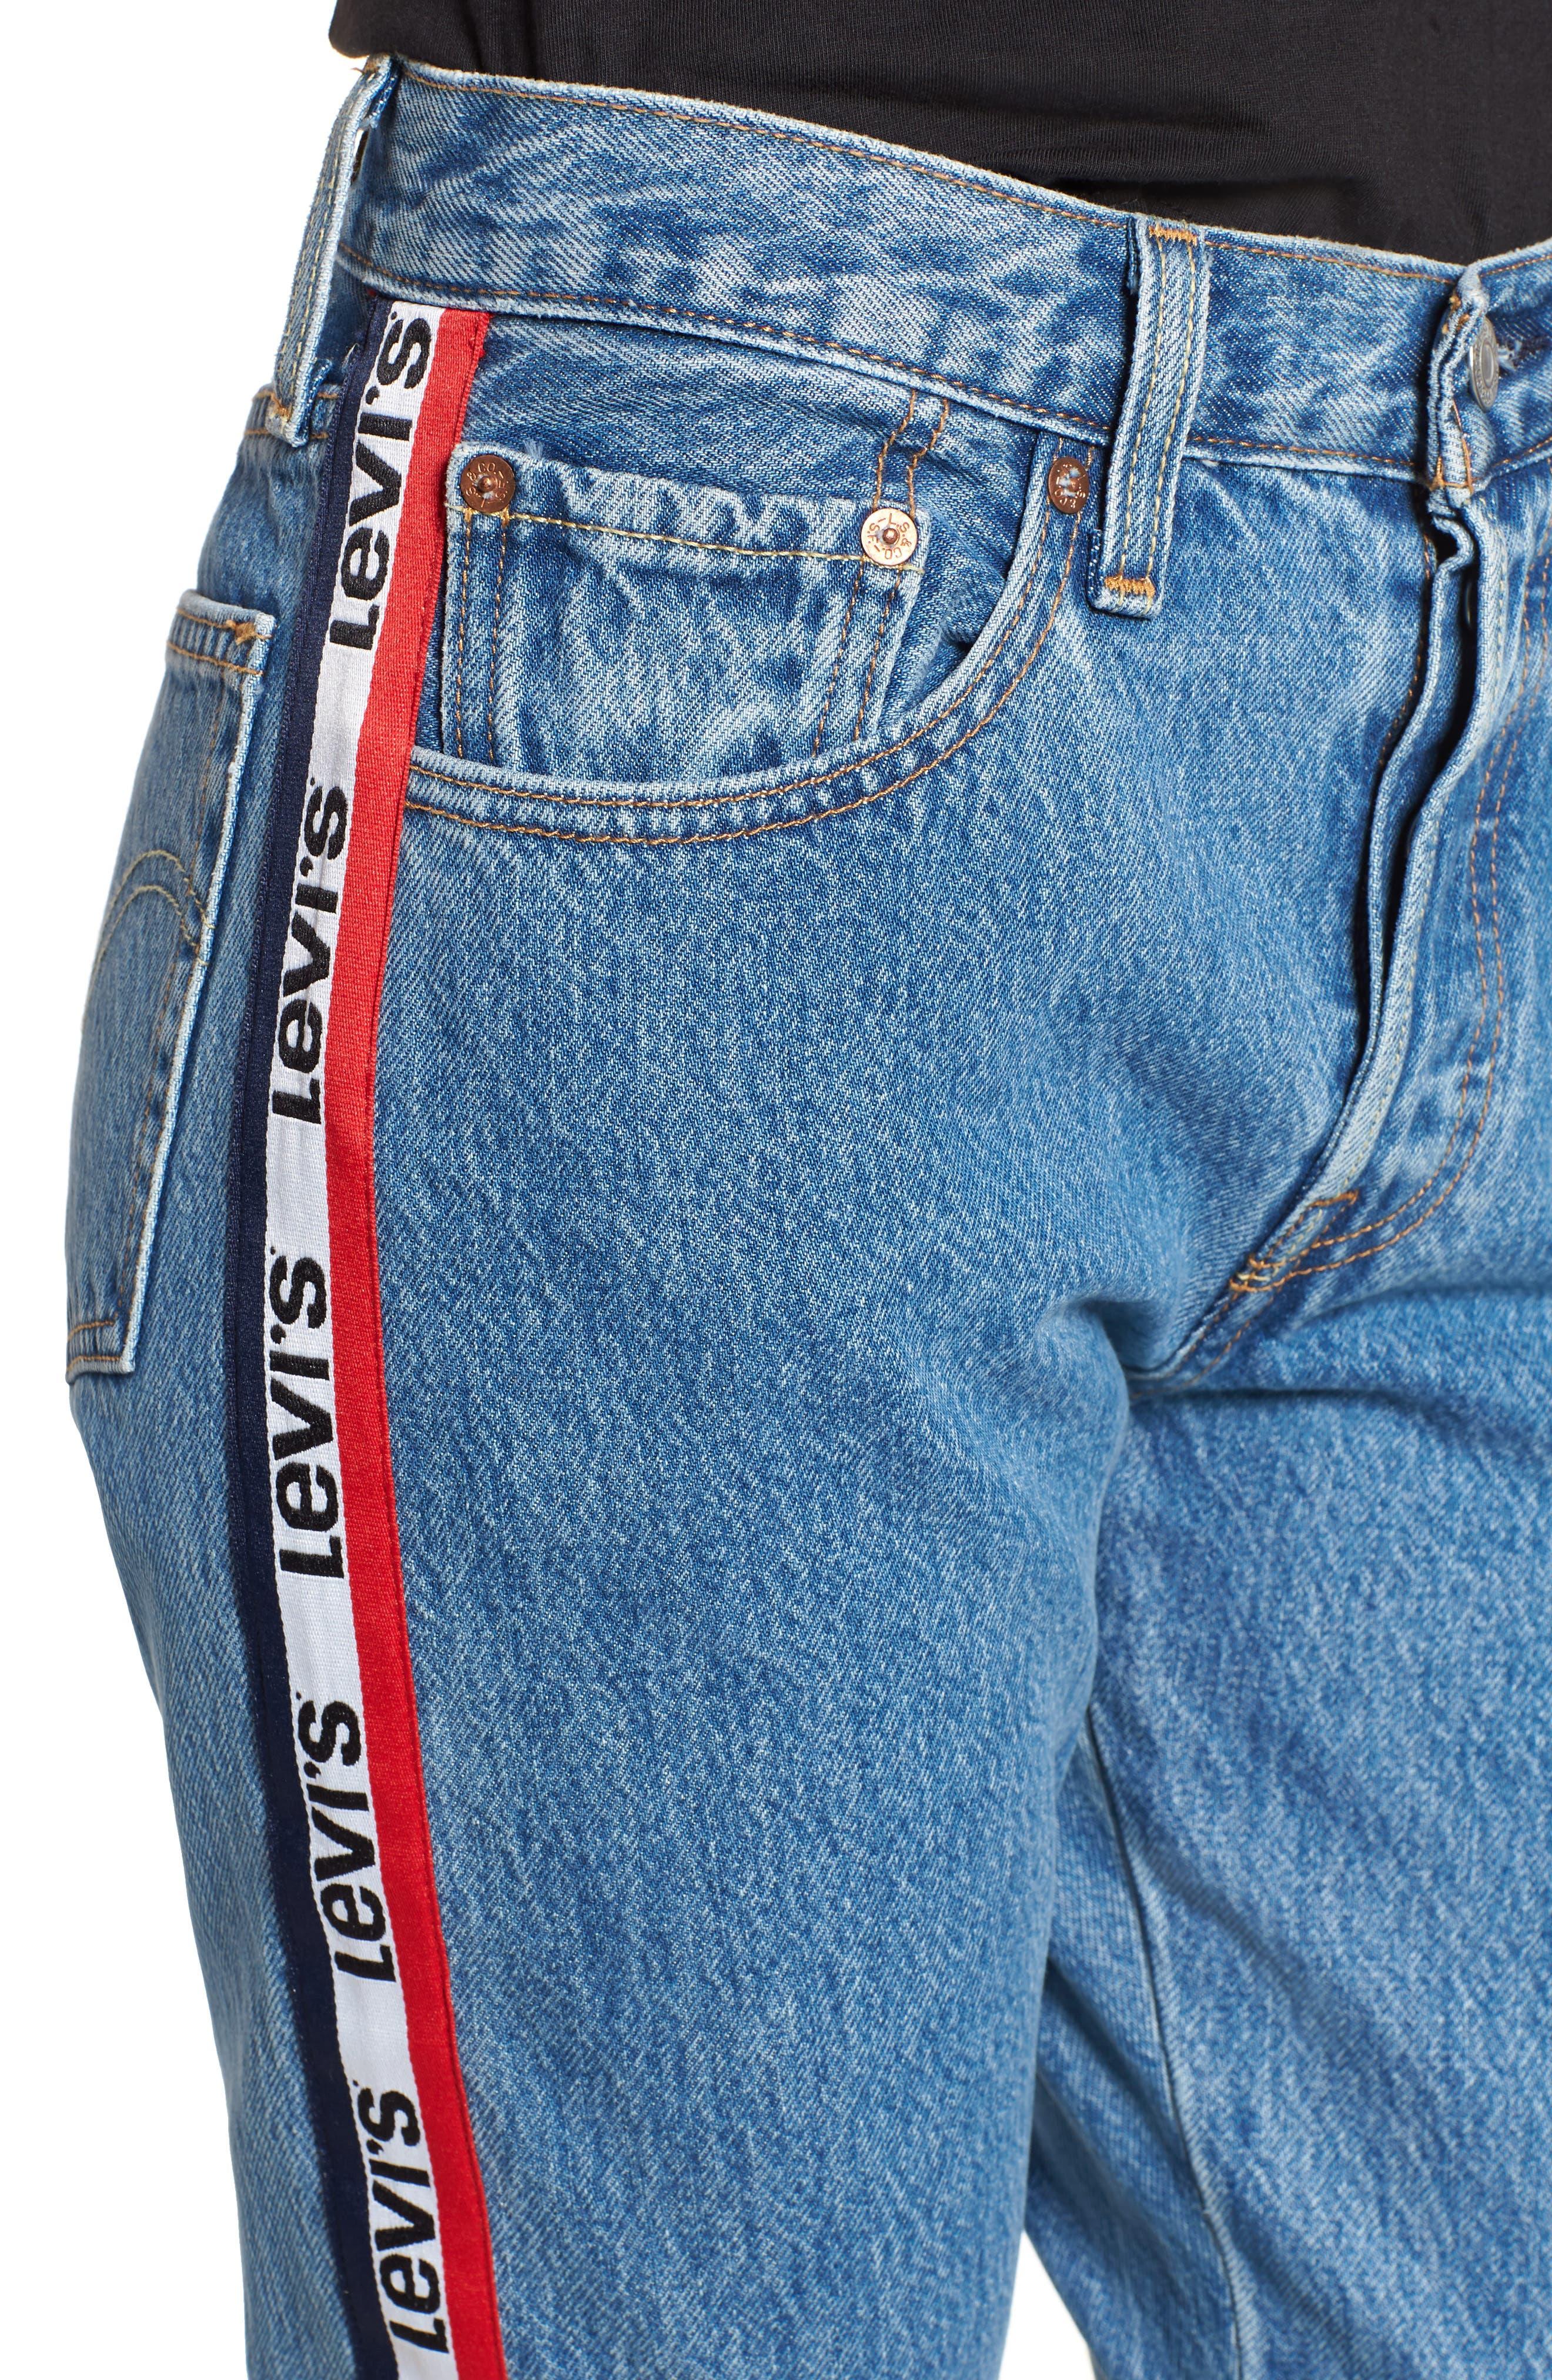 501 High Waist Crop Jeans,                             Alternate thumbnail 4, color,                             Spectator Sport